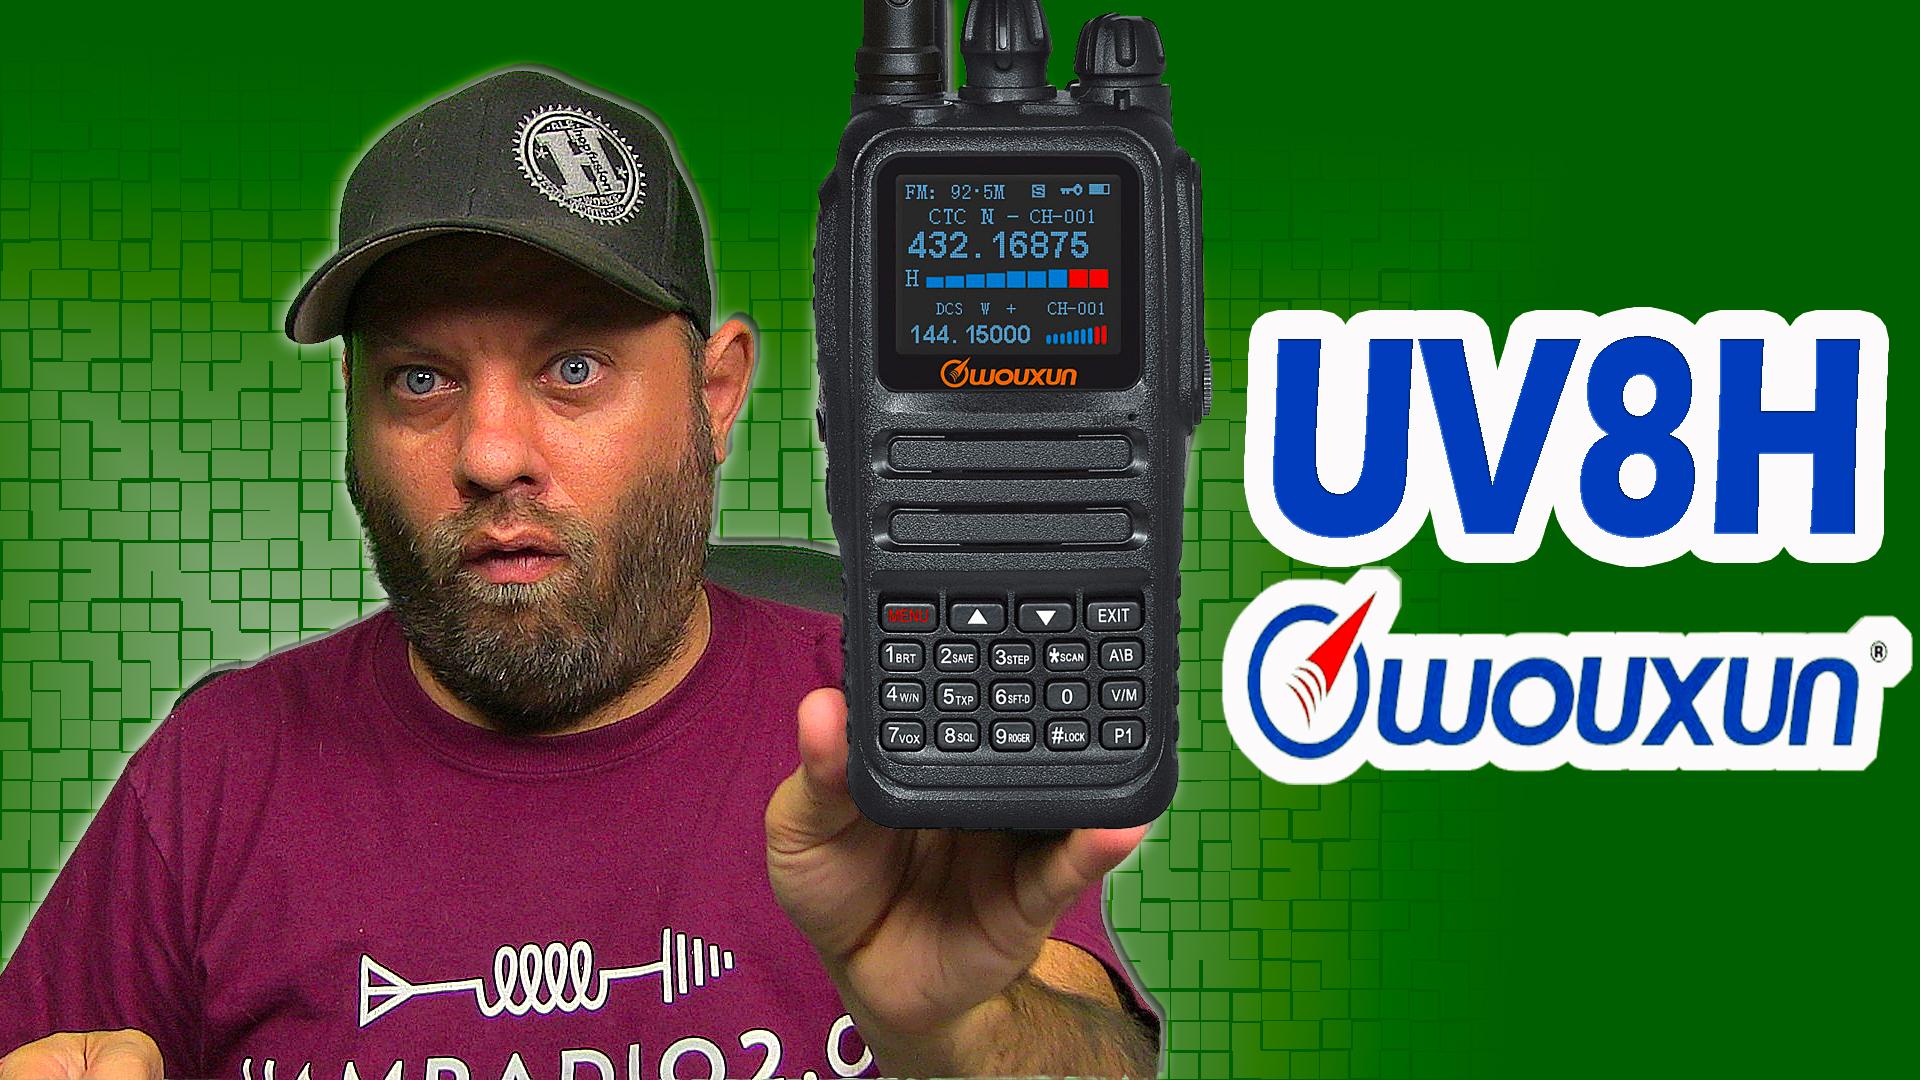 Episode 581: Wouxun REVEALS the KG-UV8H Dual Band 8-watt HT Radio